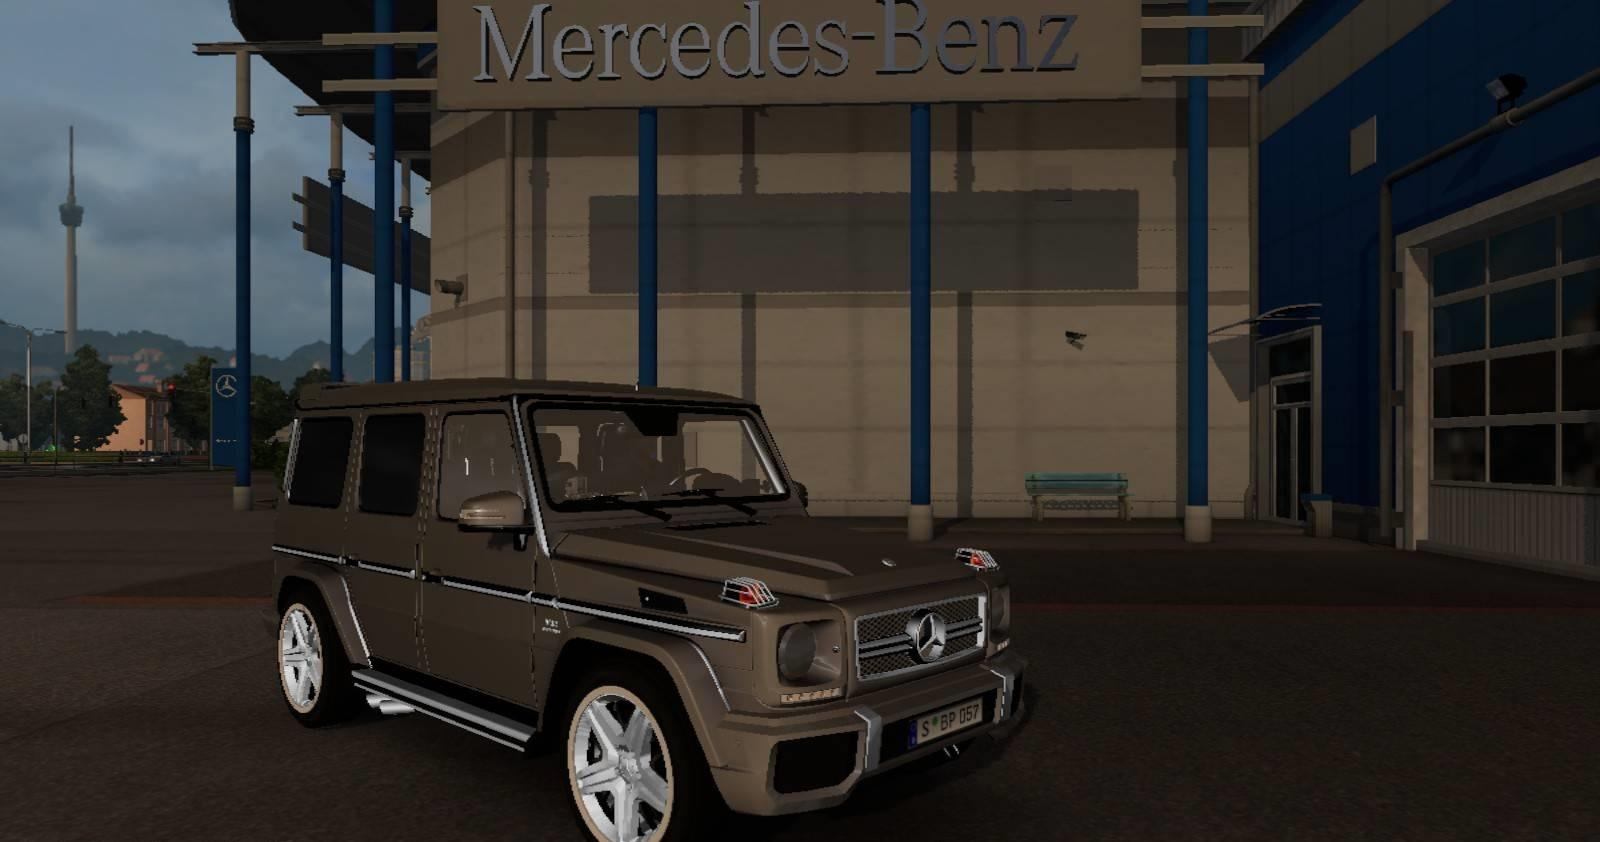 SEX AGENCY Mercedes